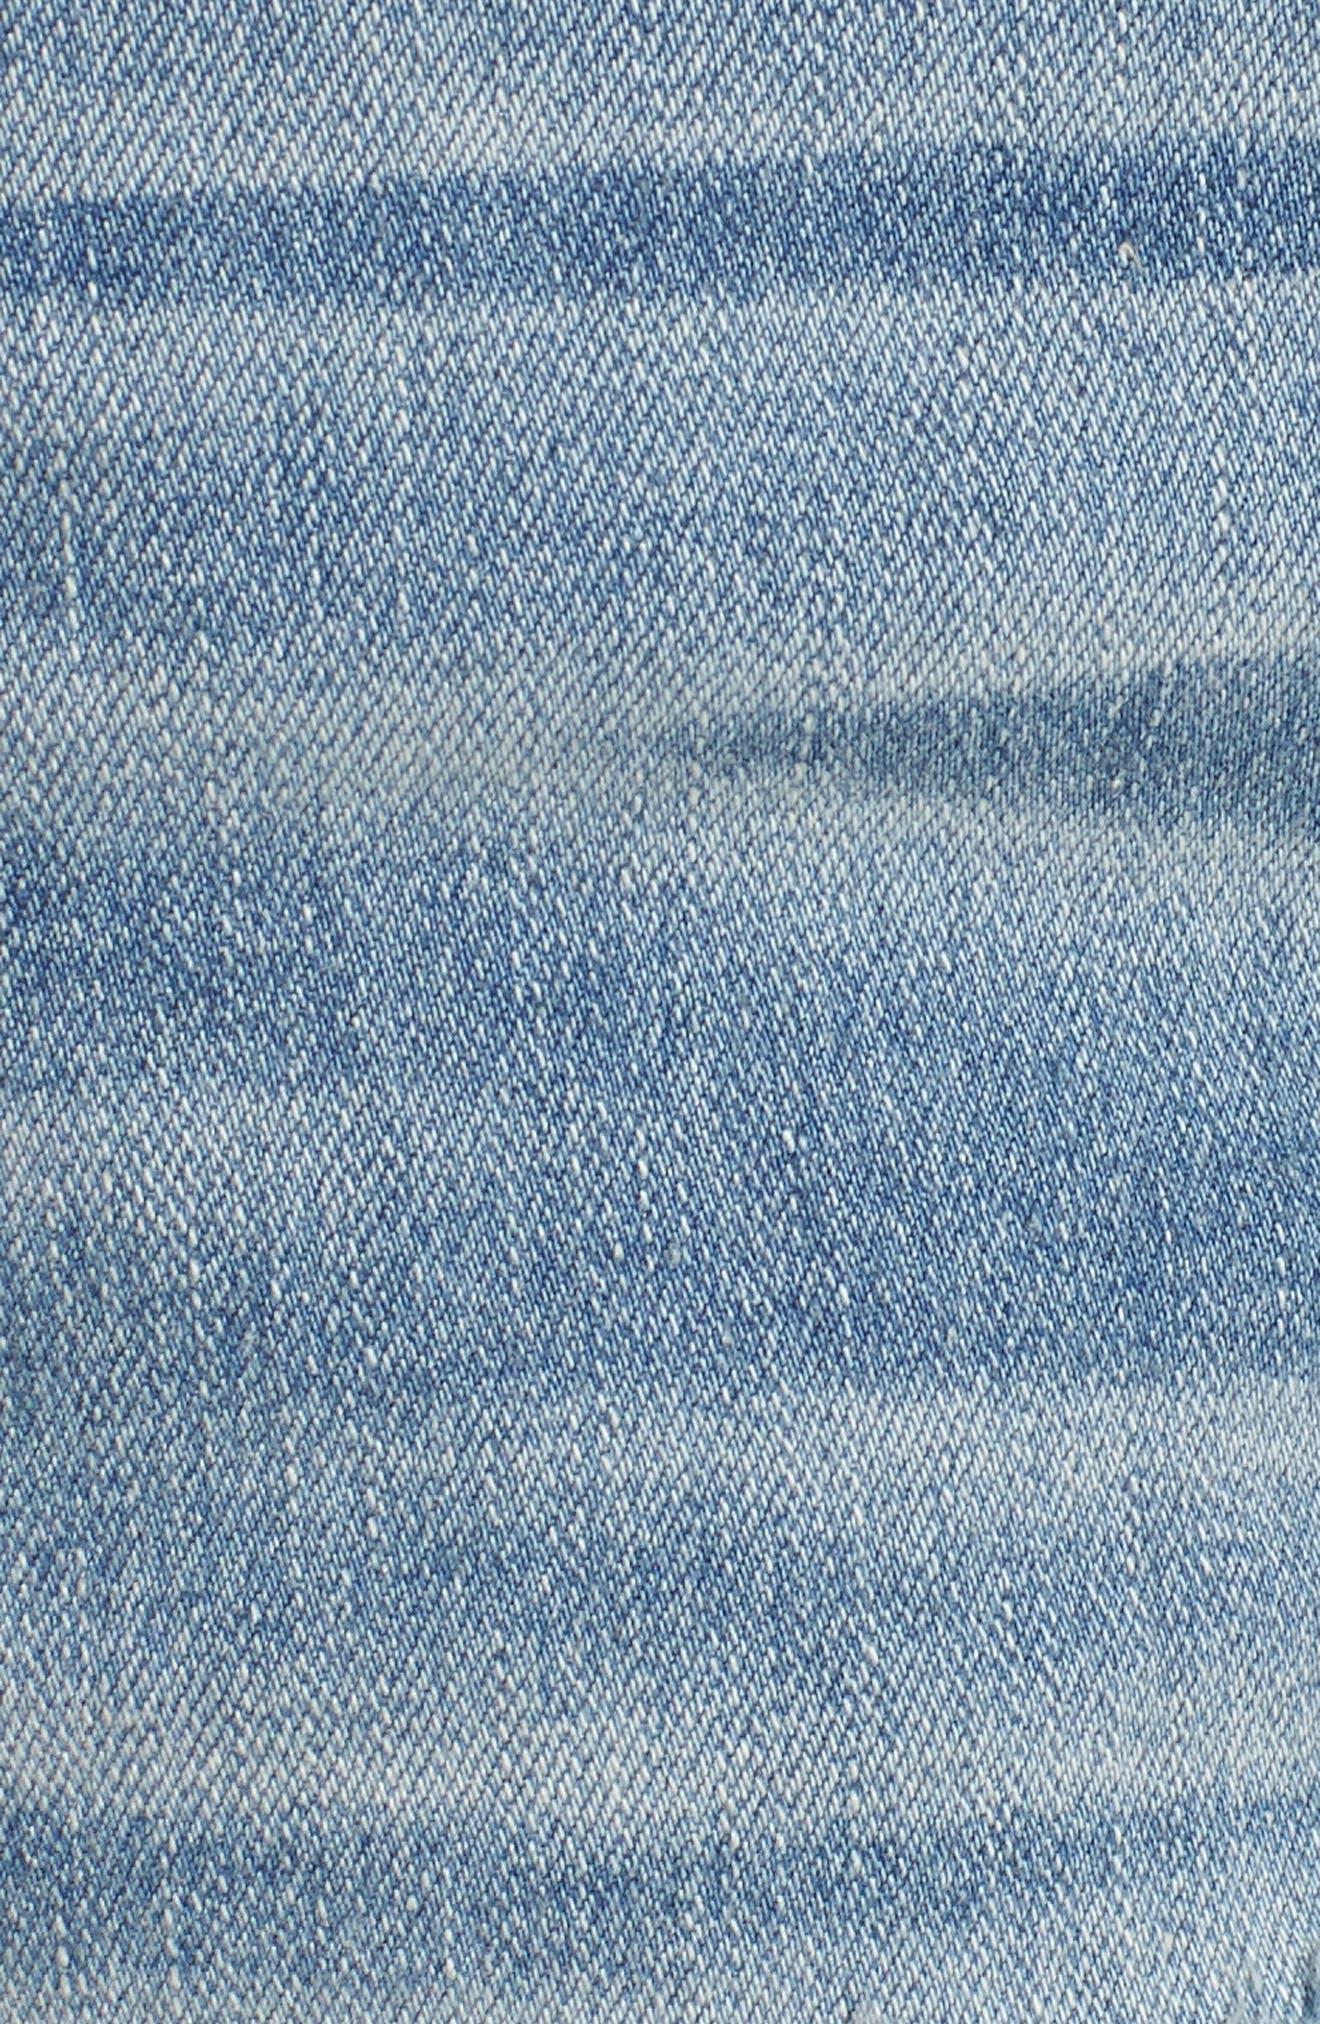 Marley Denim Shorts,                             Alternate thumbnail 6, color,                             Light Wash